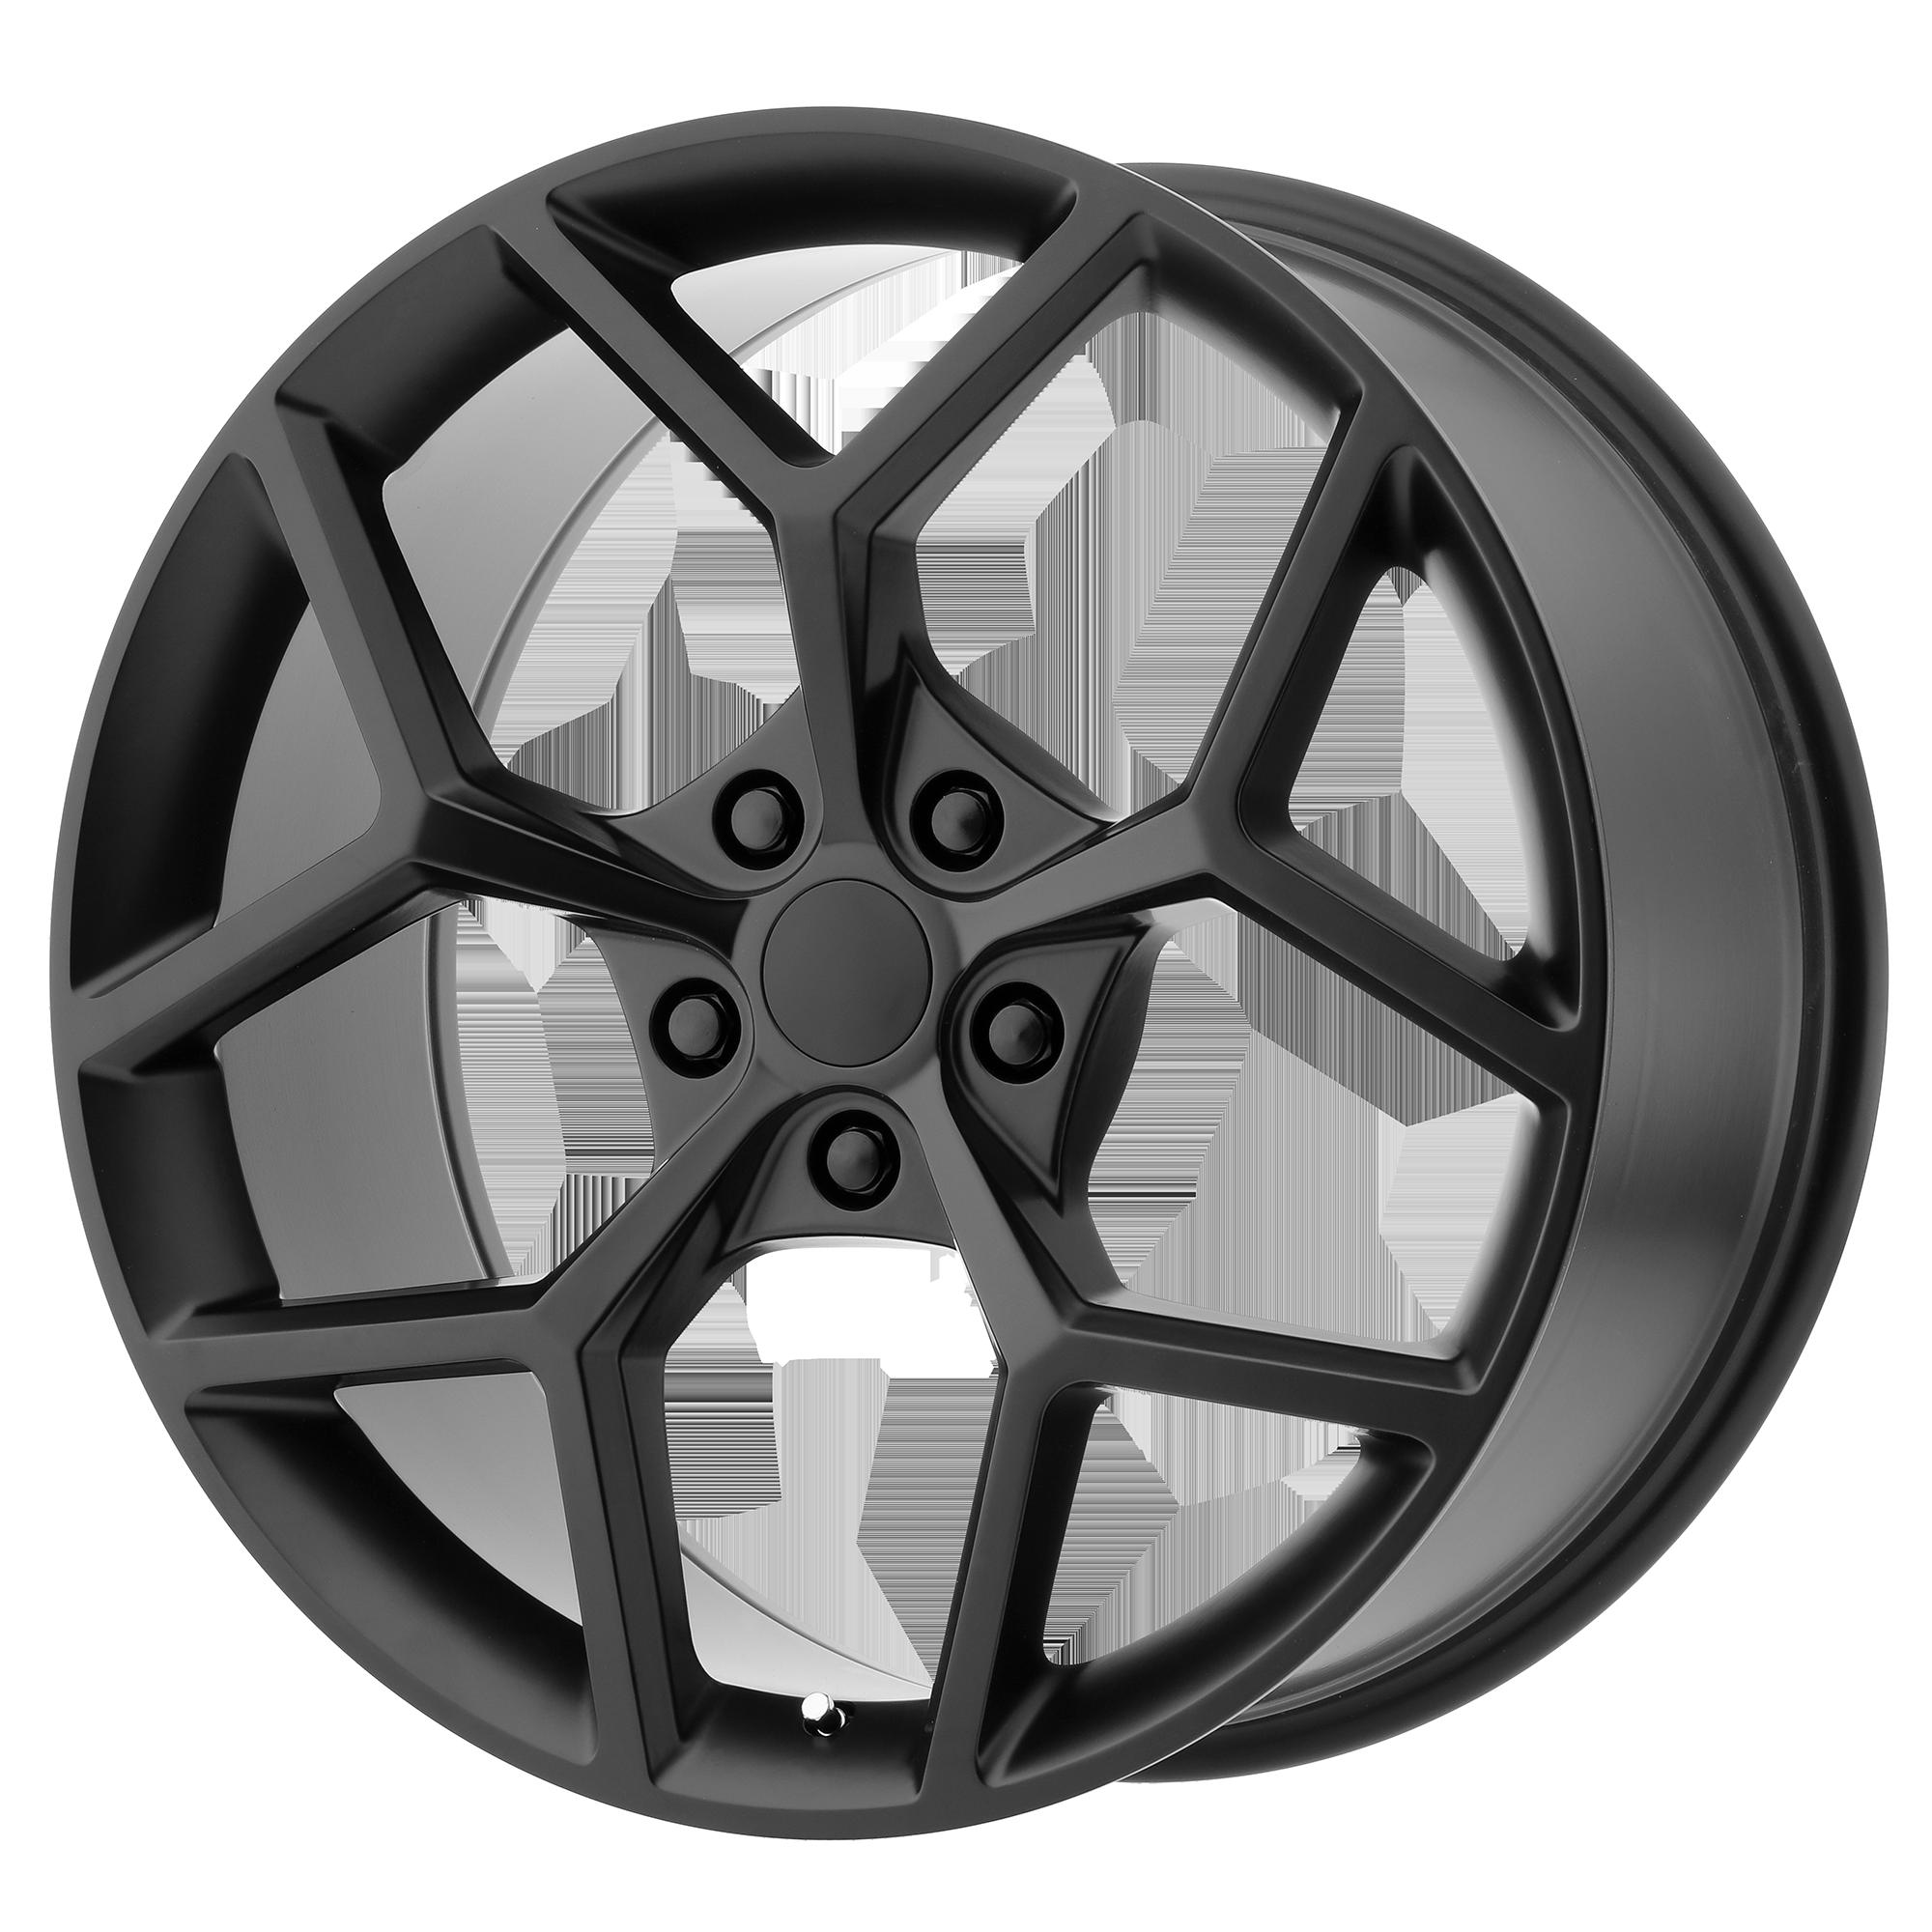 OE Creations Replica Wheels OE Creations PR126 Matte Black